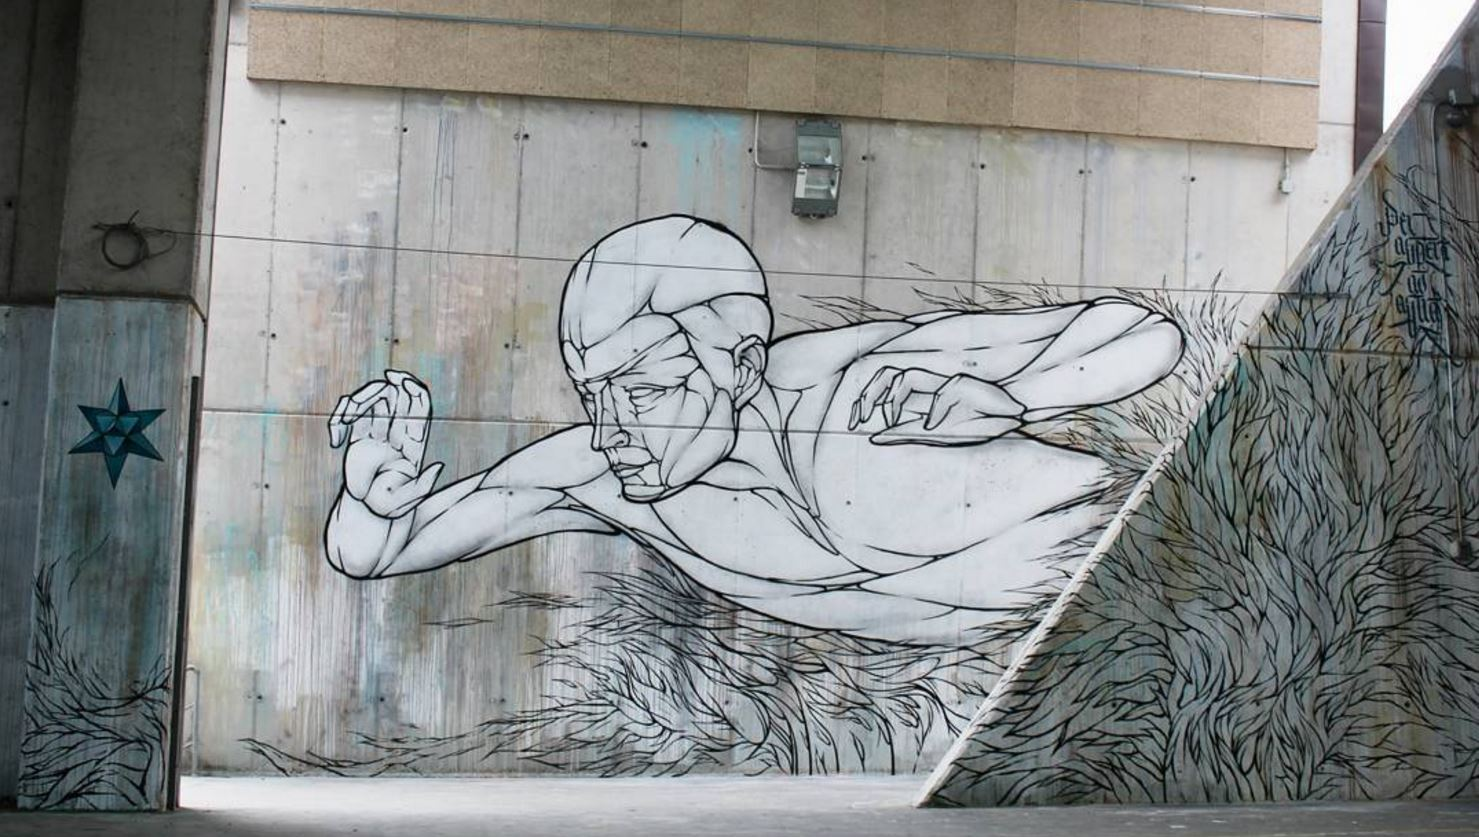 Nikita Nomerz graffiti arte de rua russo faces vida (11)